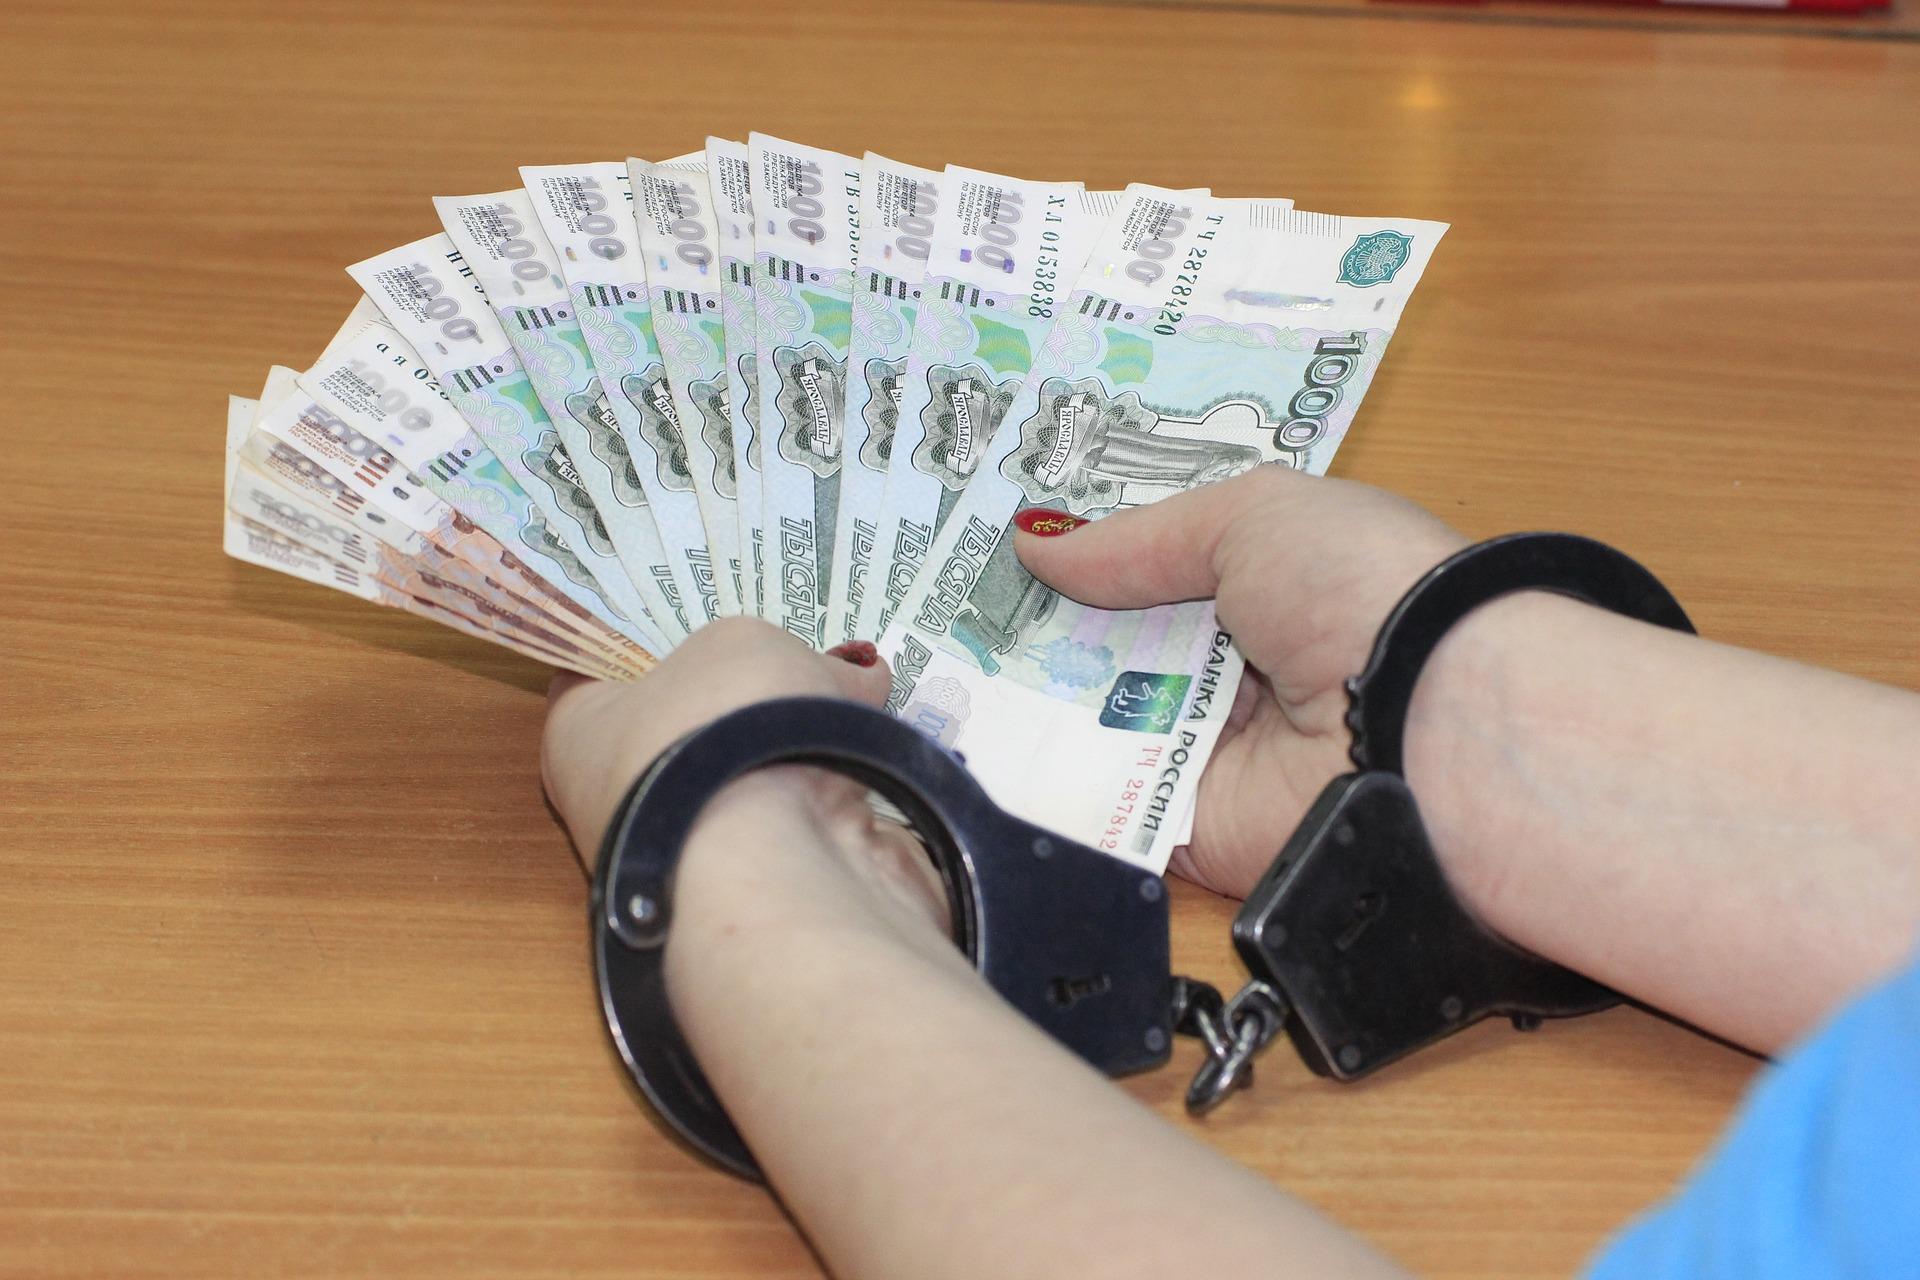 дача взятки и получение взятки